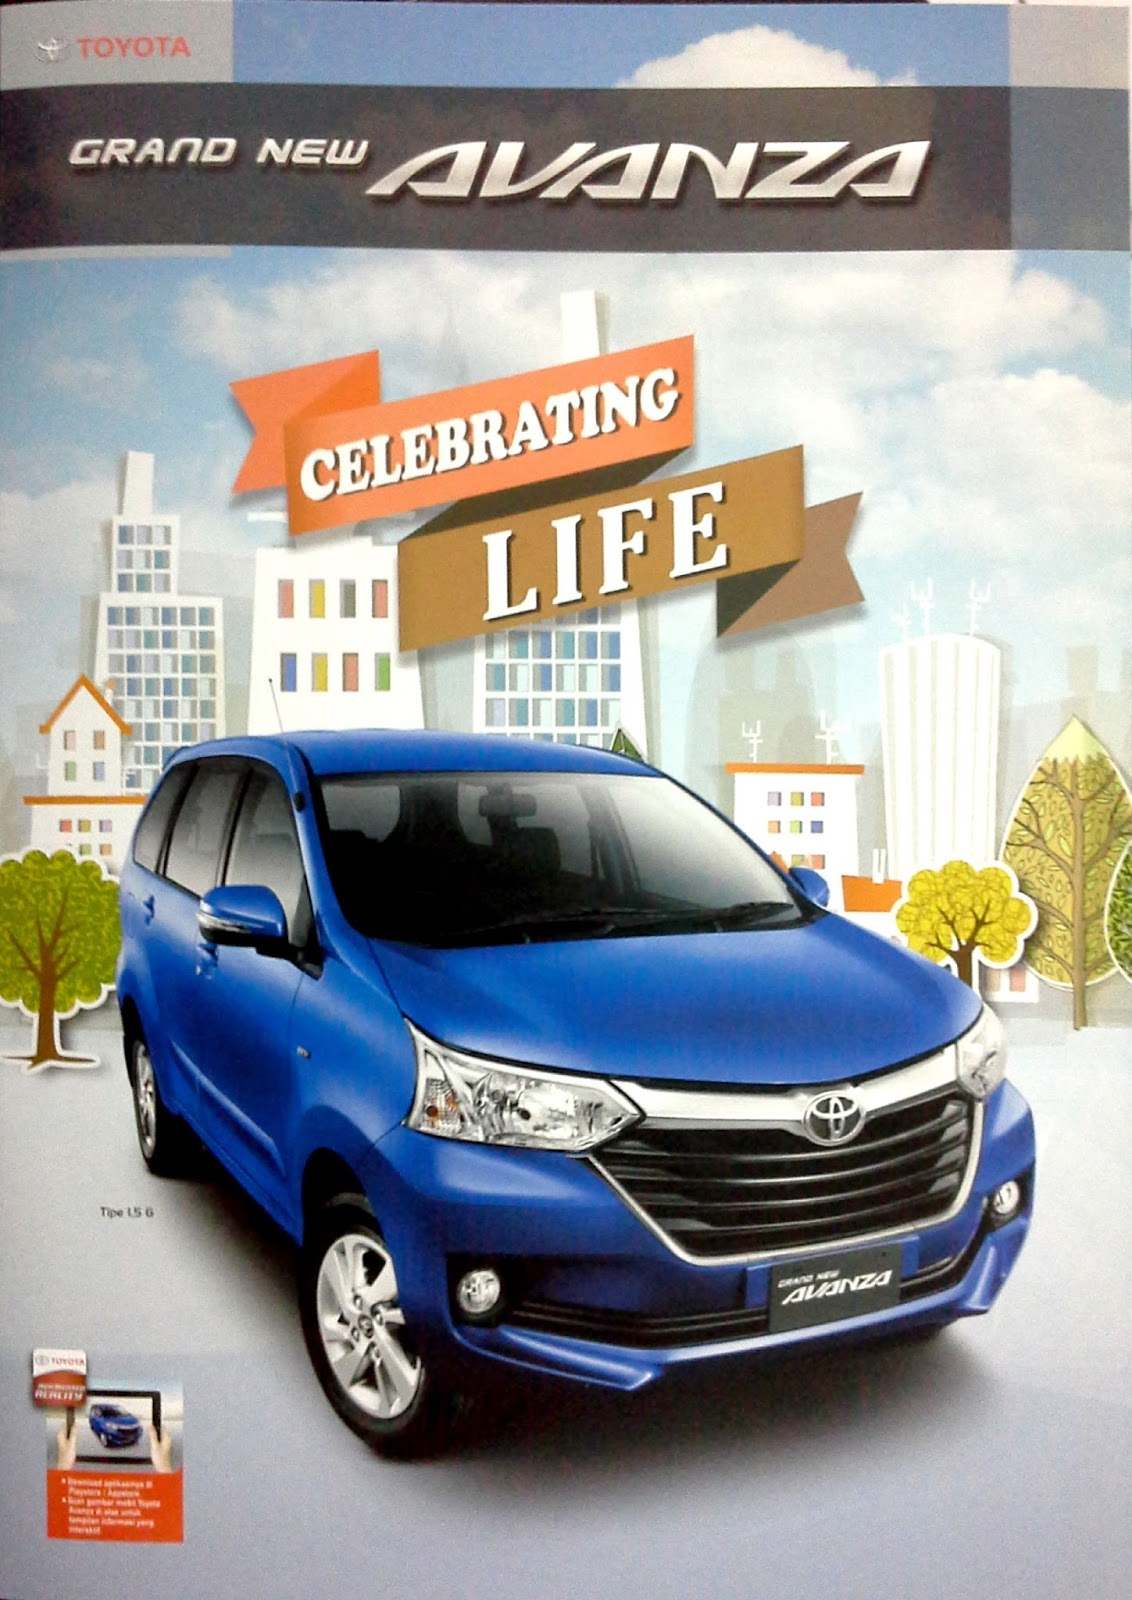 Grand New Avanza Veloz 1.3 1.5 Jual Beli Harga Toyota Jakarta